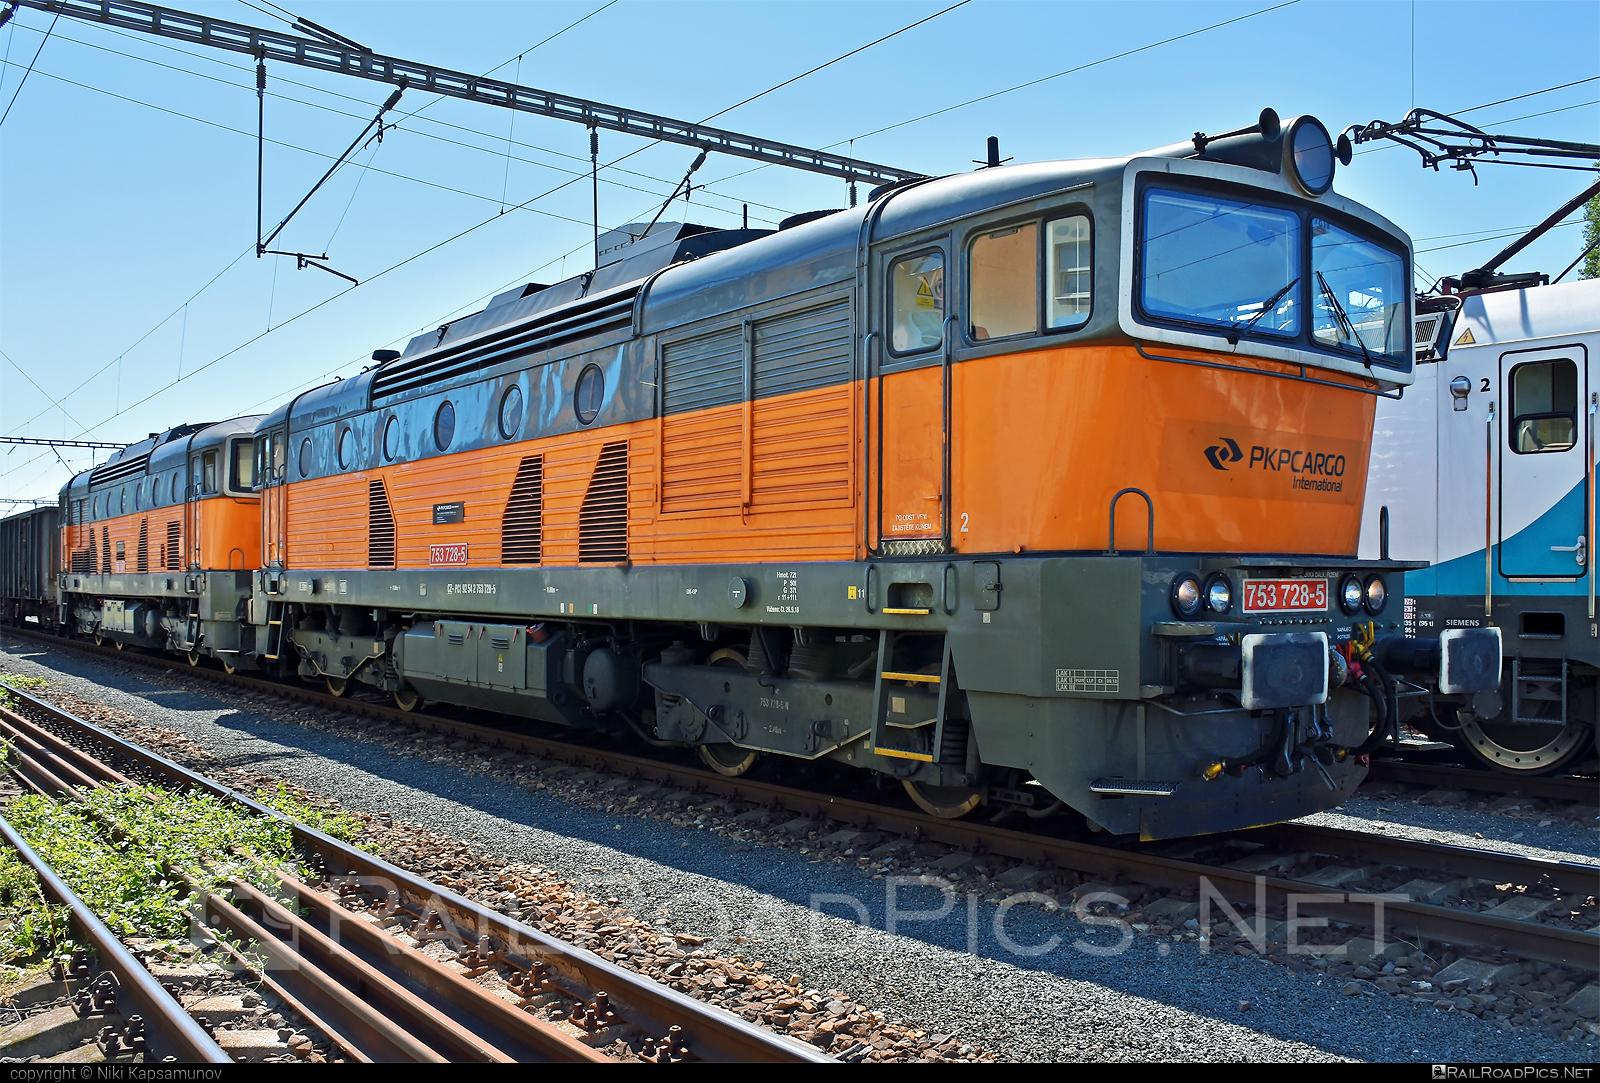 ČKD T 478.3 (753) - 753 728-5 operated by PKP CARGO INTERNATIONAL a.s. #brejlovec #ckd #ckdclass753 #ckdt4783 #locomotive753 #okuliarnik #pkpcargointernational #pkpcargointernationalas #pkpci